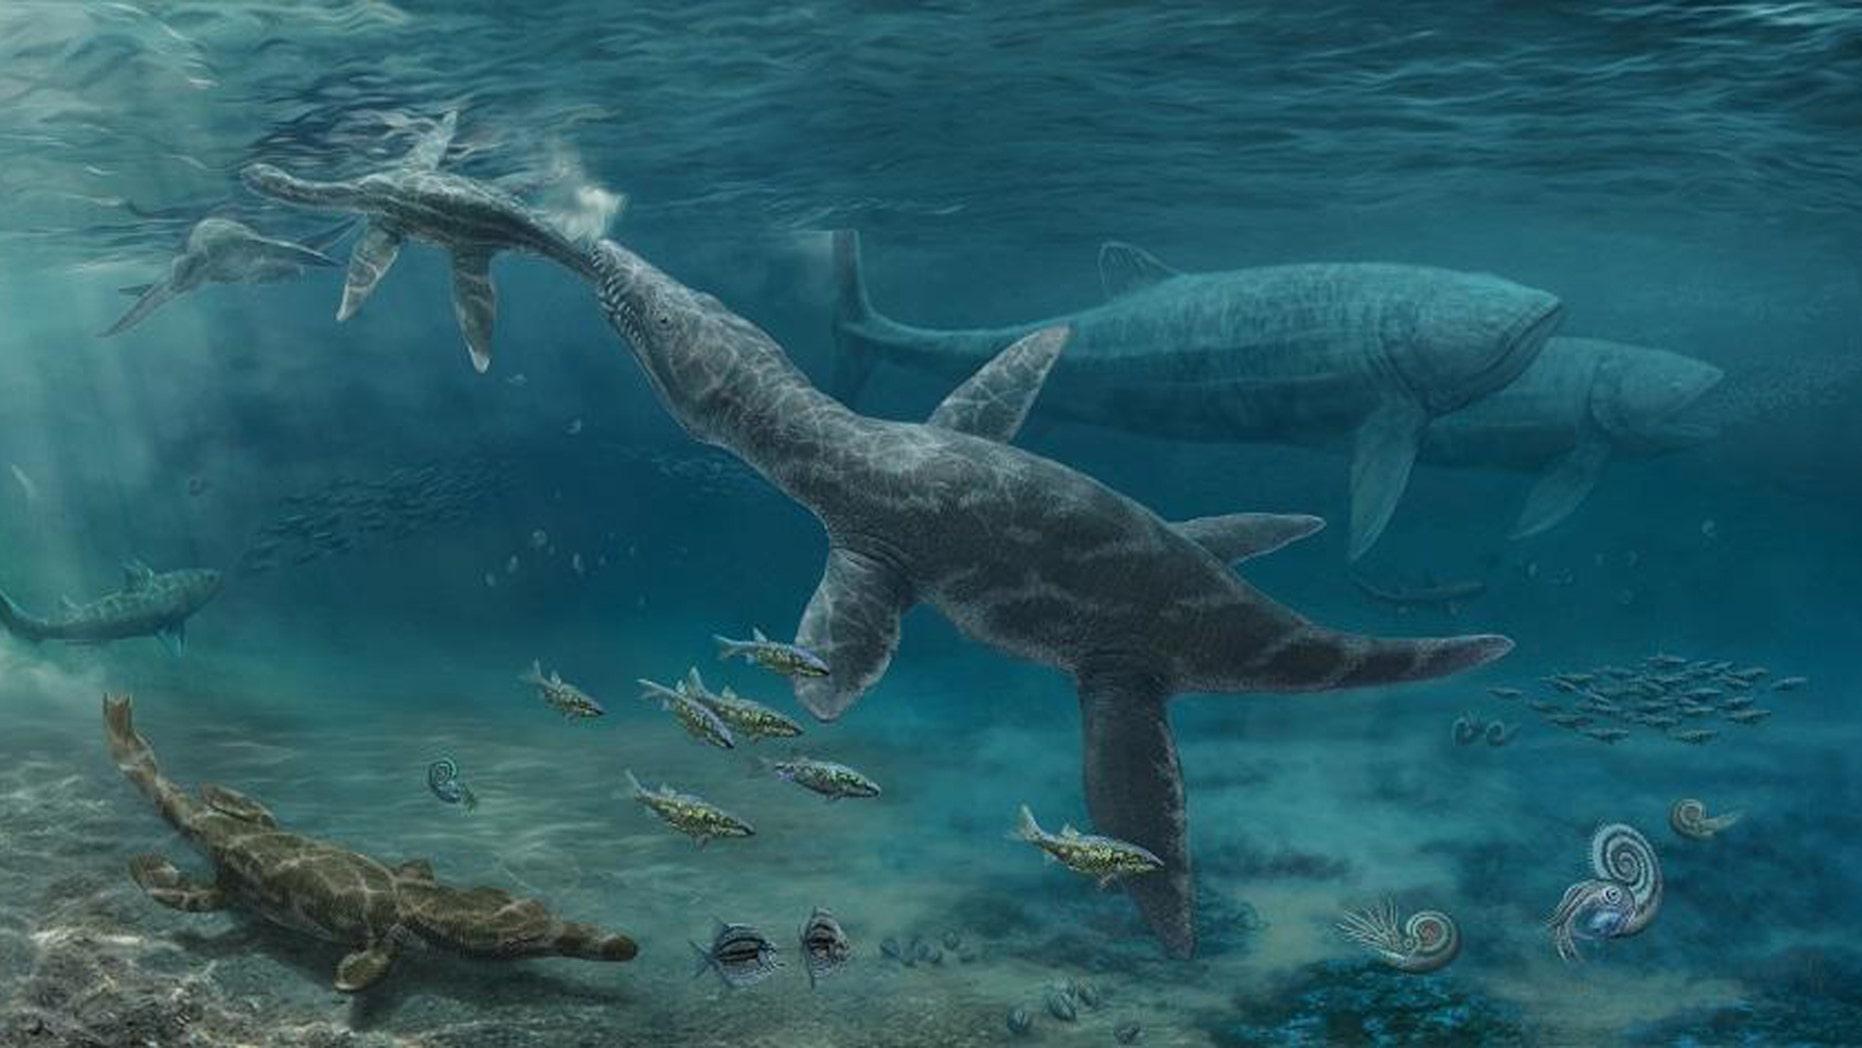 Artist's impression of Jurassic seas (Credit: Nikolay Zverkov)